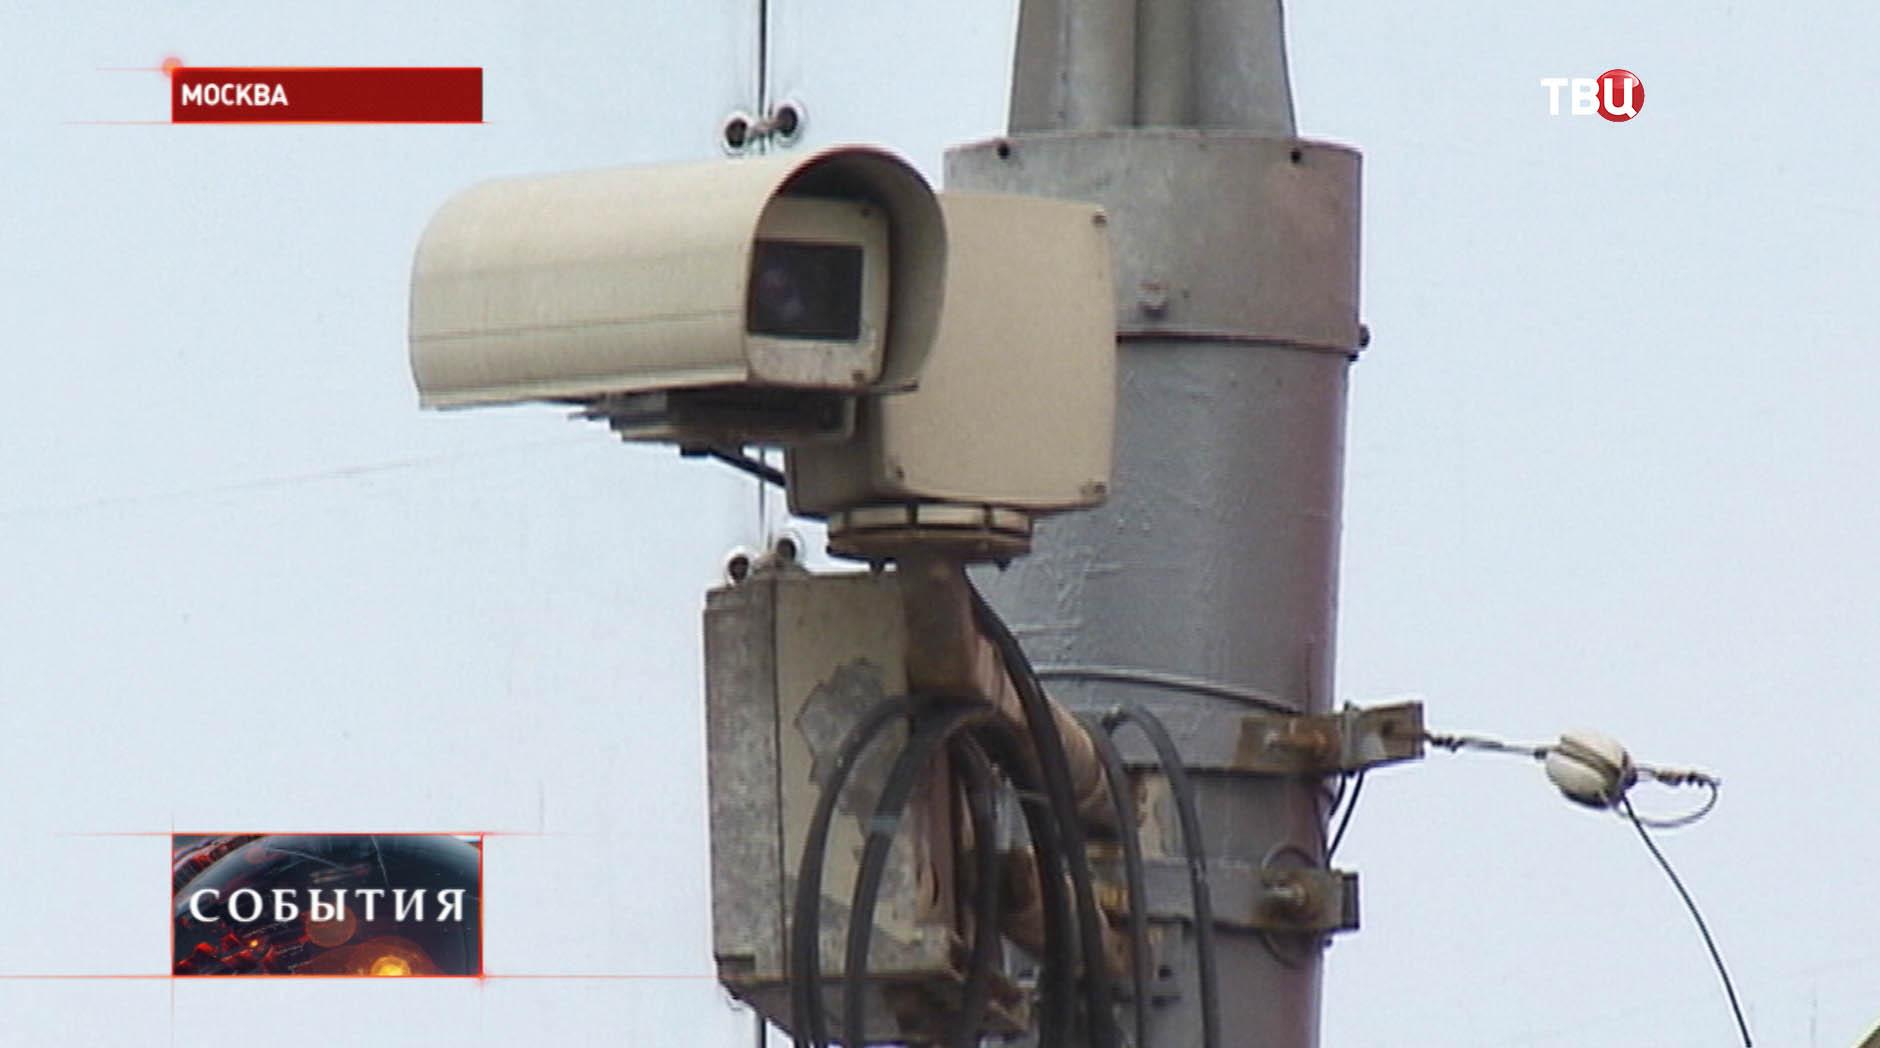 Камера видеофиксации нарушений